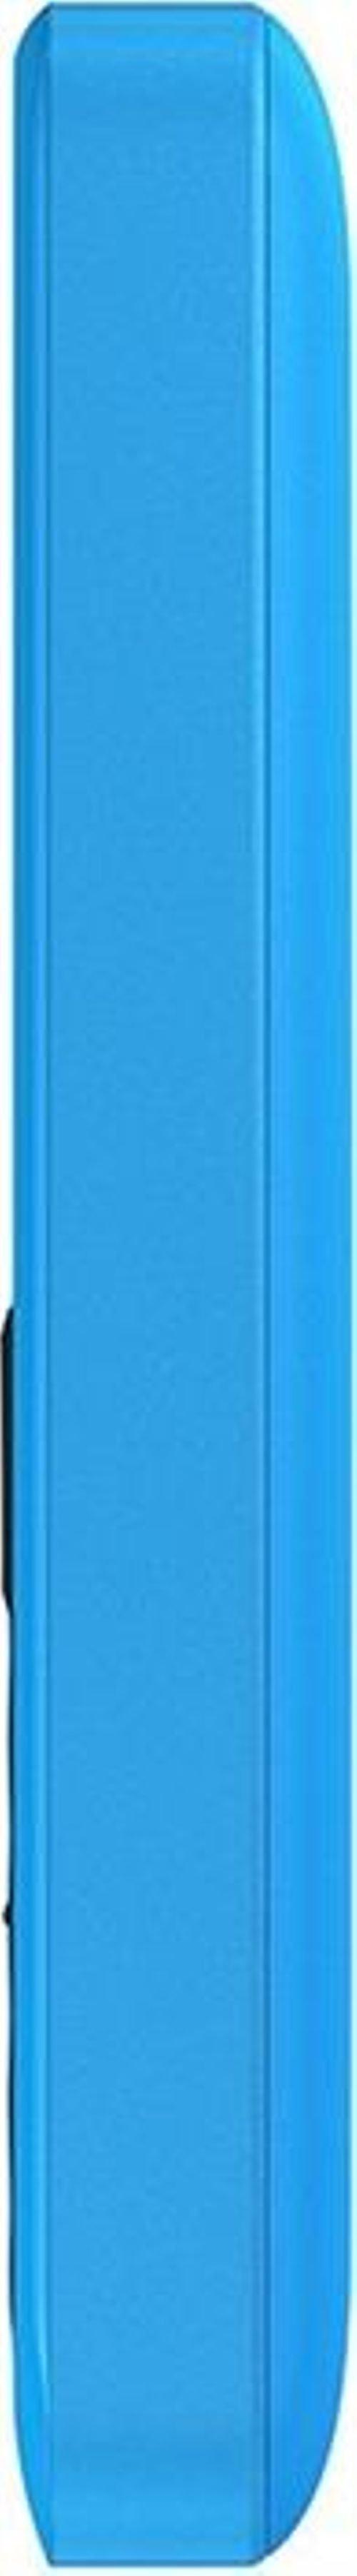 Nokia 105 Dual-SIM Phone side 8MB 1.4inch Cyan NOKIA 105